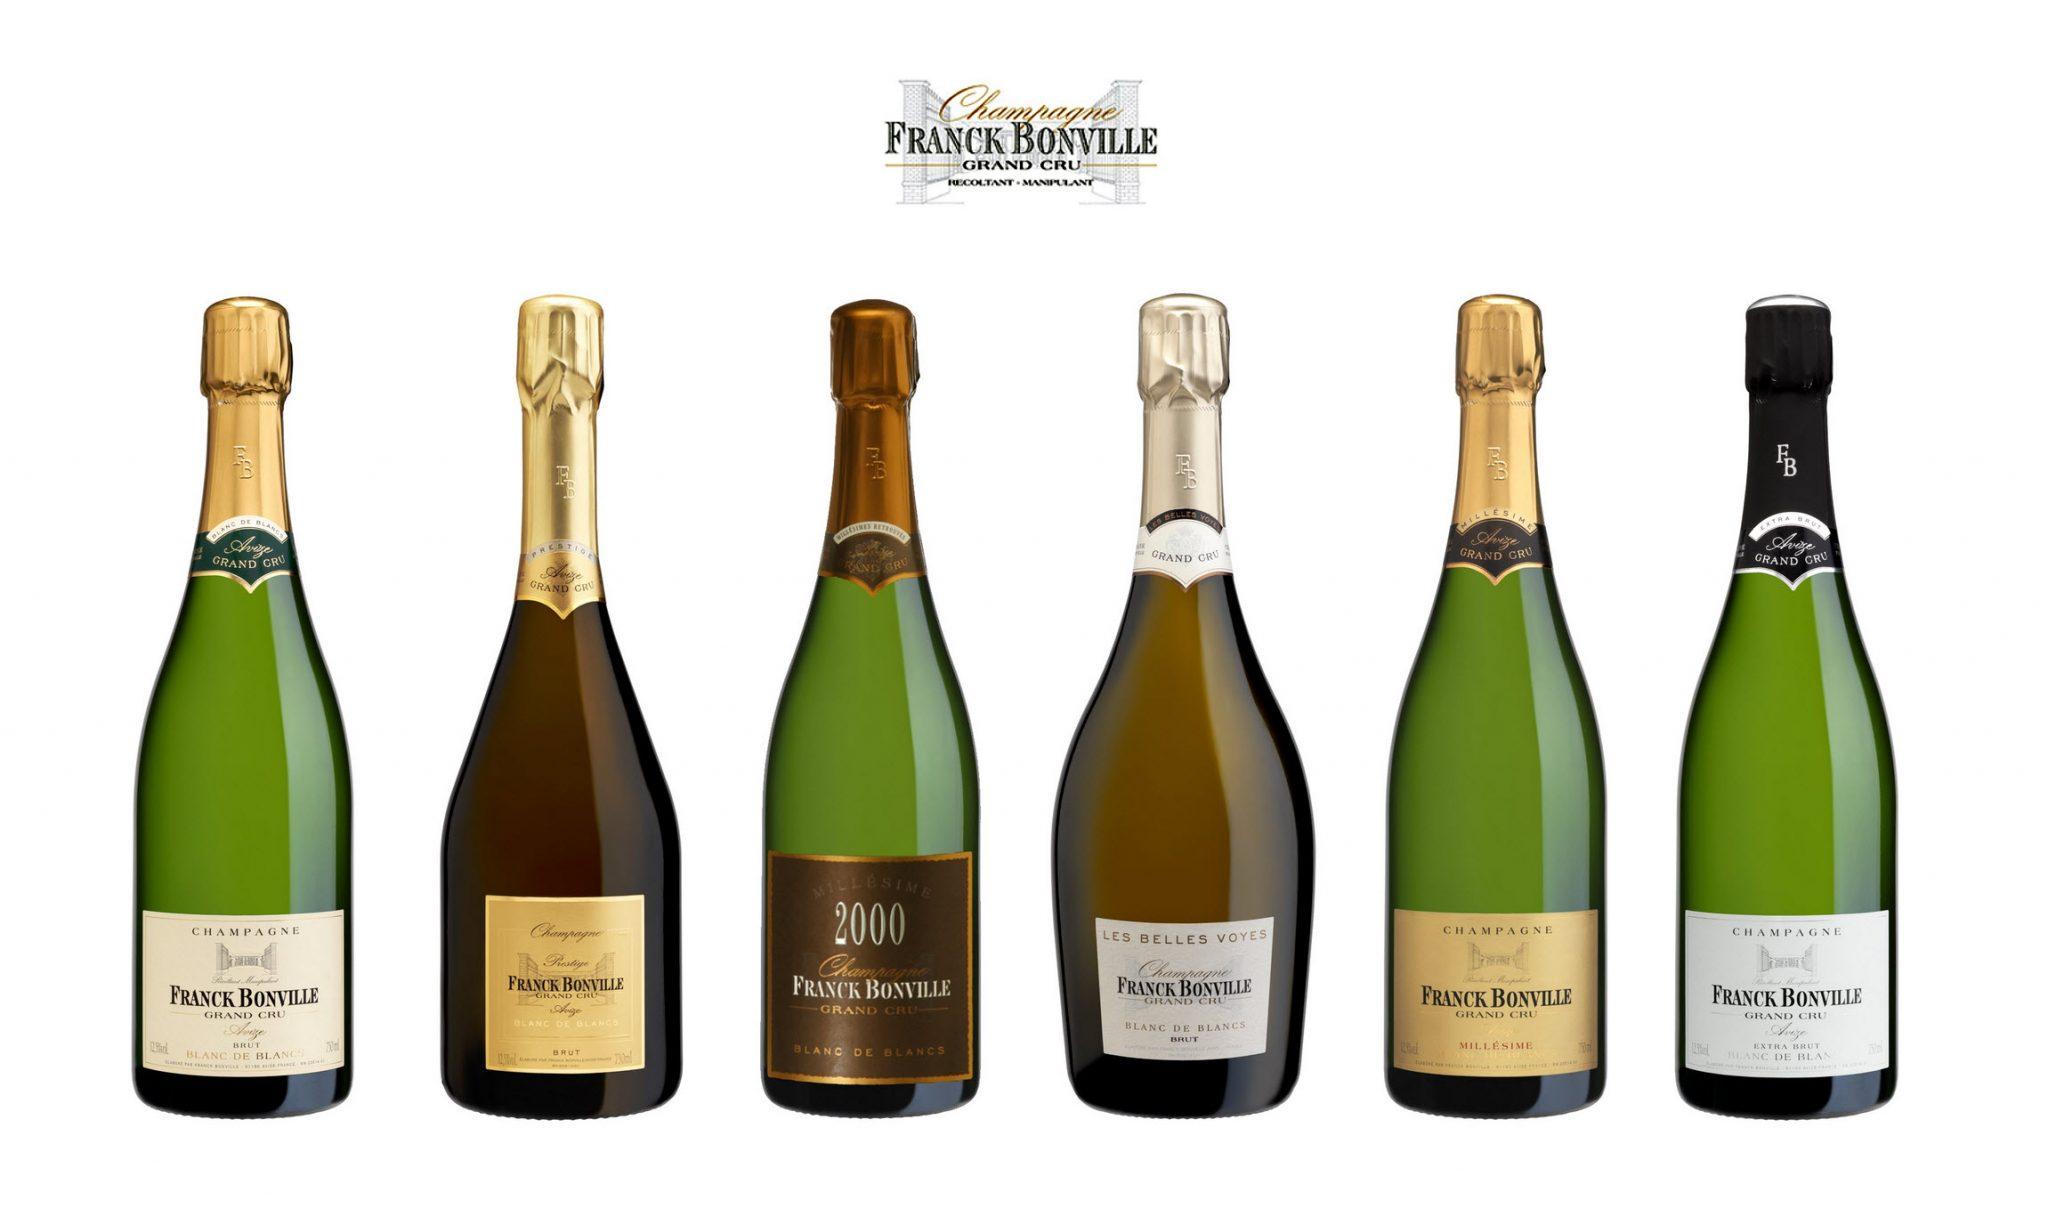 Champagne franck bonville for Piscine de champagne